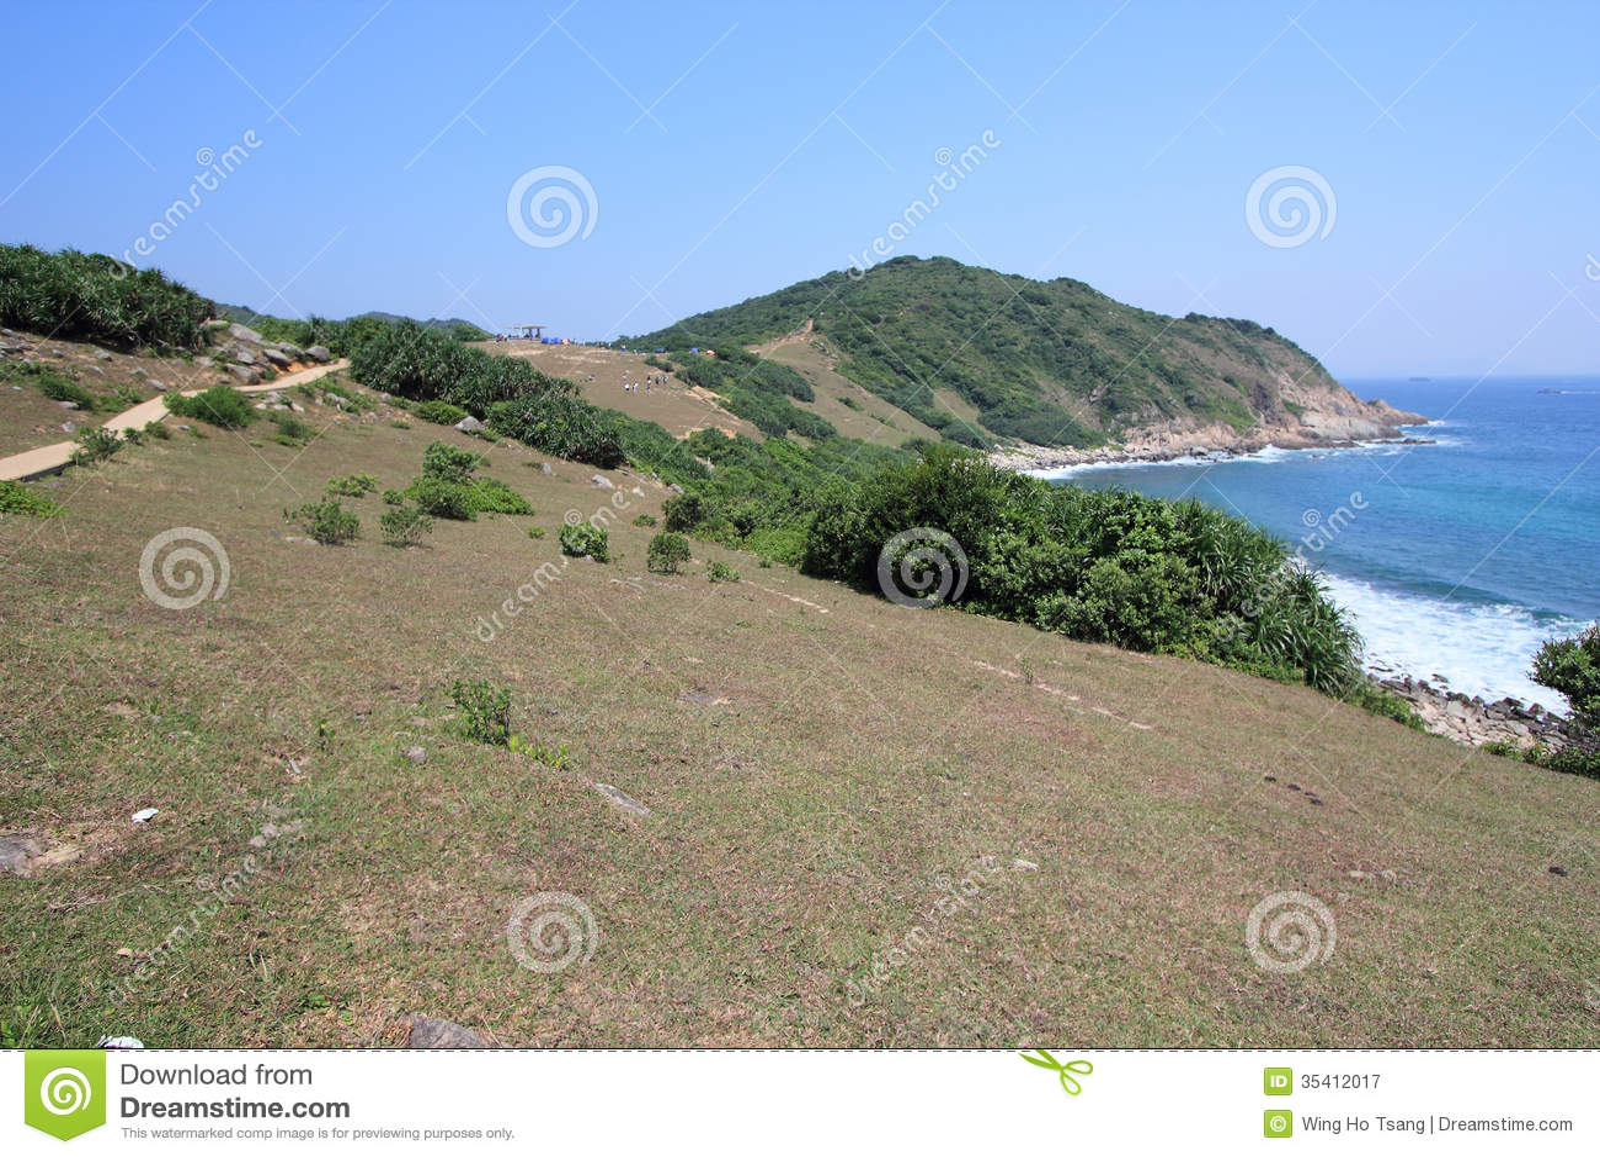 Coast, vegetation, headland, promontory, bay, hill, terrain, cape, sky, coastal, and, oceanic, landforms, shore, sea, land, lot, e